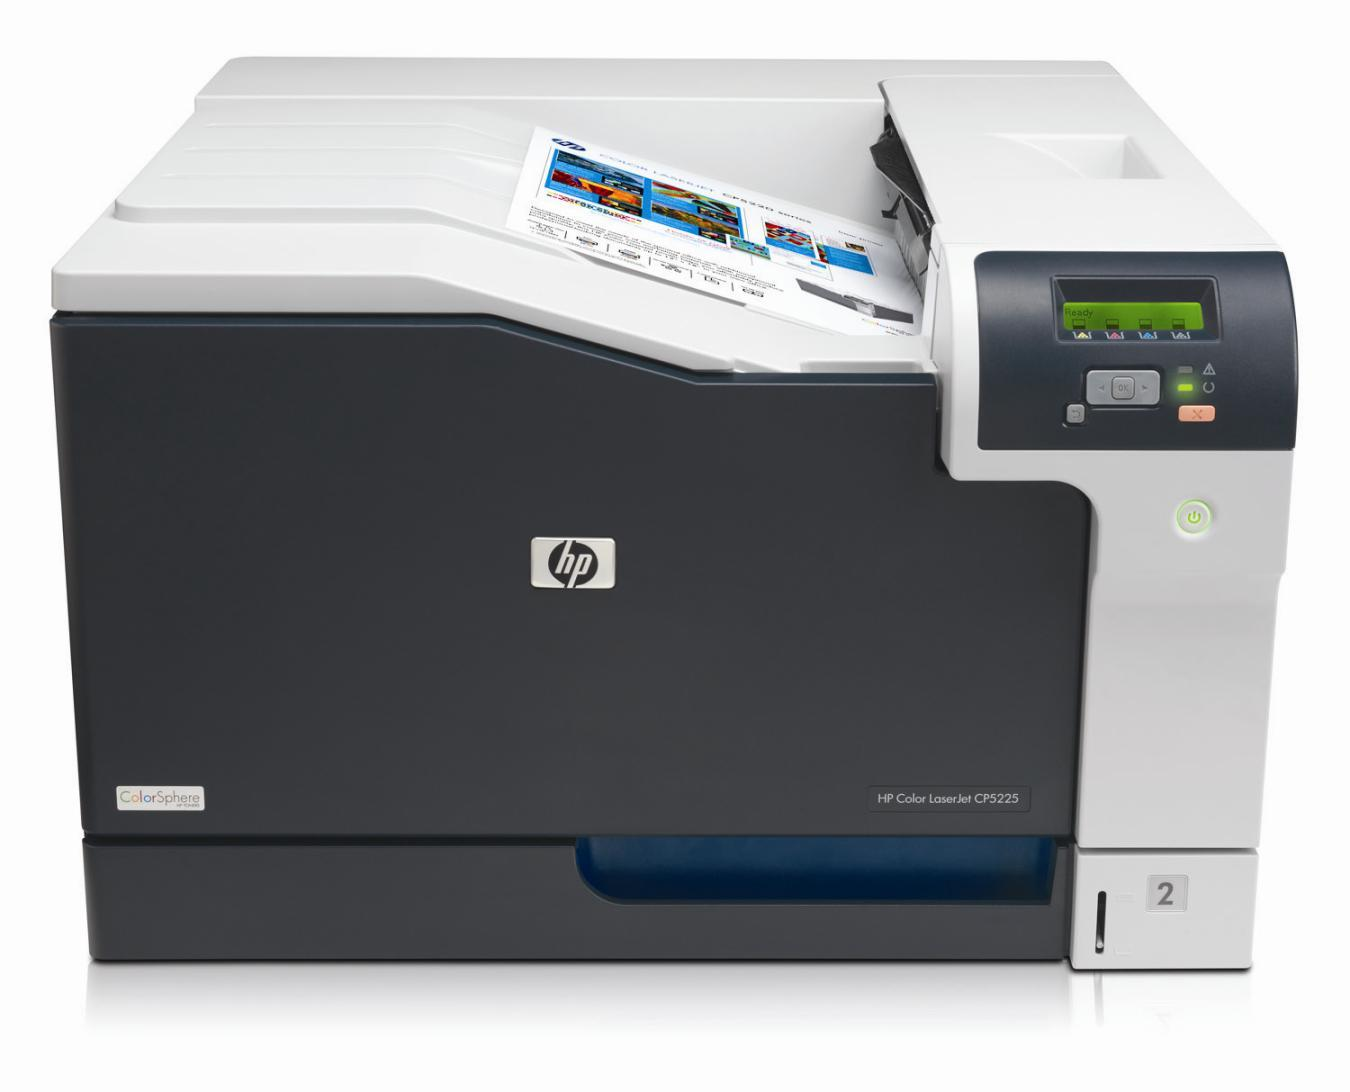 HP Color LaserJet Professional CP5225n (A3, 20/20 ppm A4, USB 2.0, Ethernet)